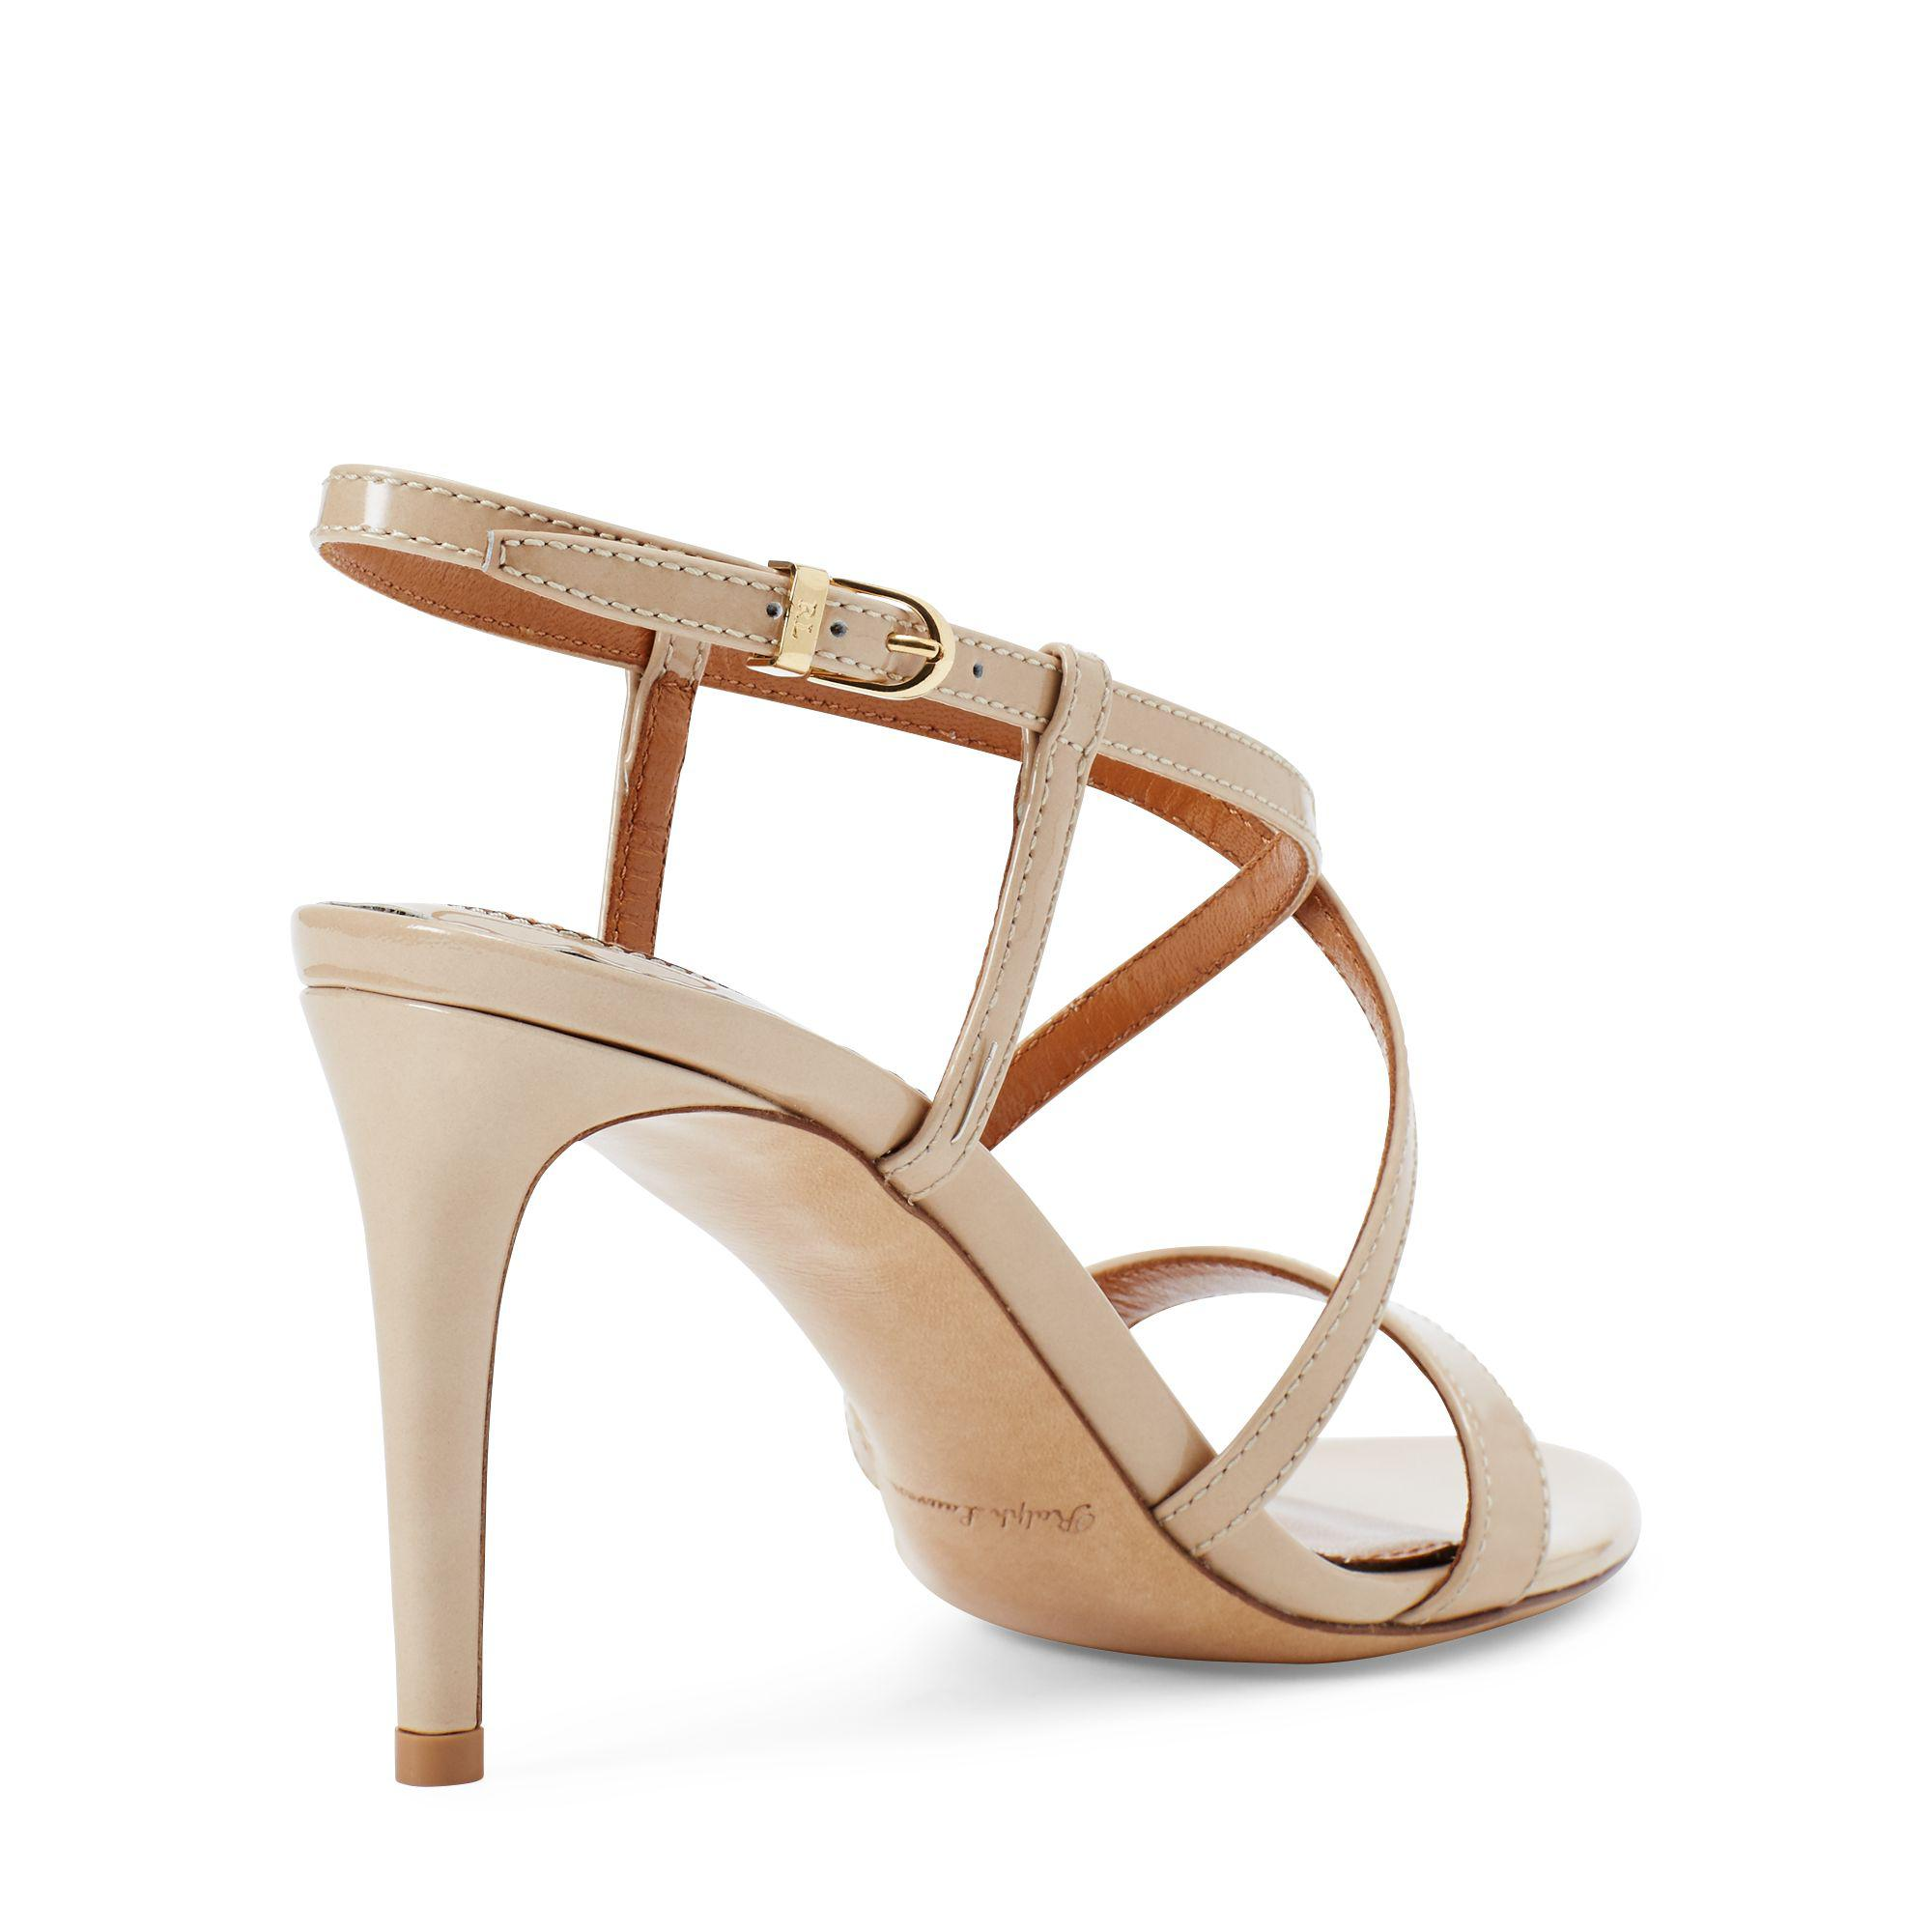 Lauren Ralph Lauren Gwen Patent Leather Dress Sandals